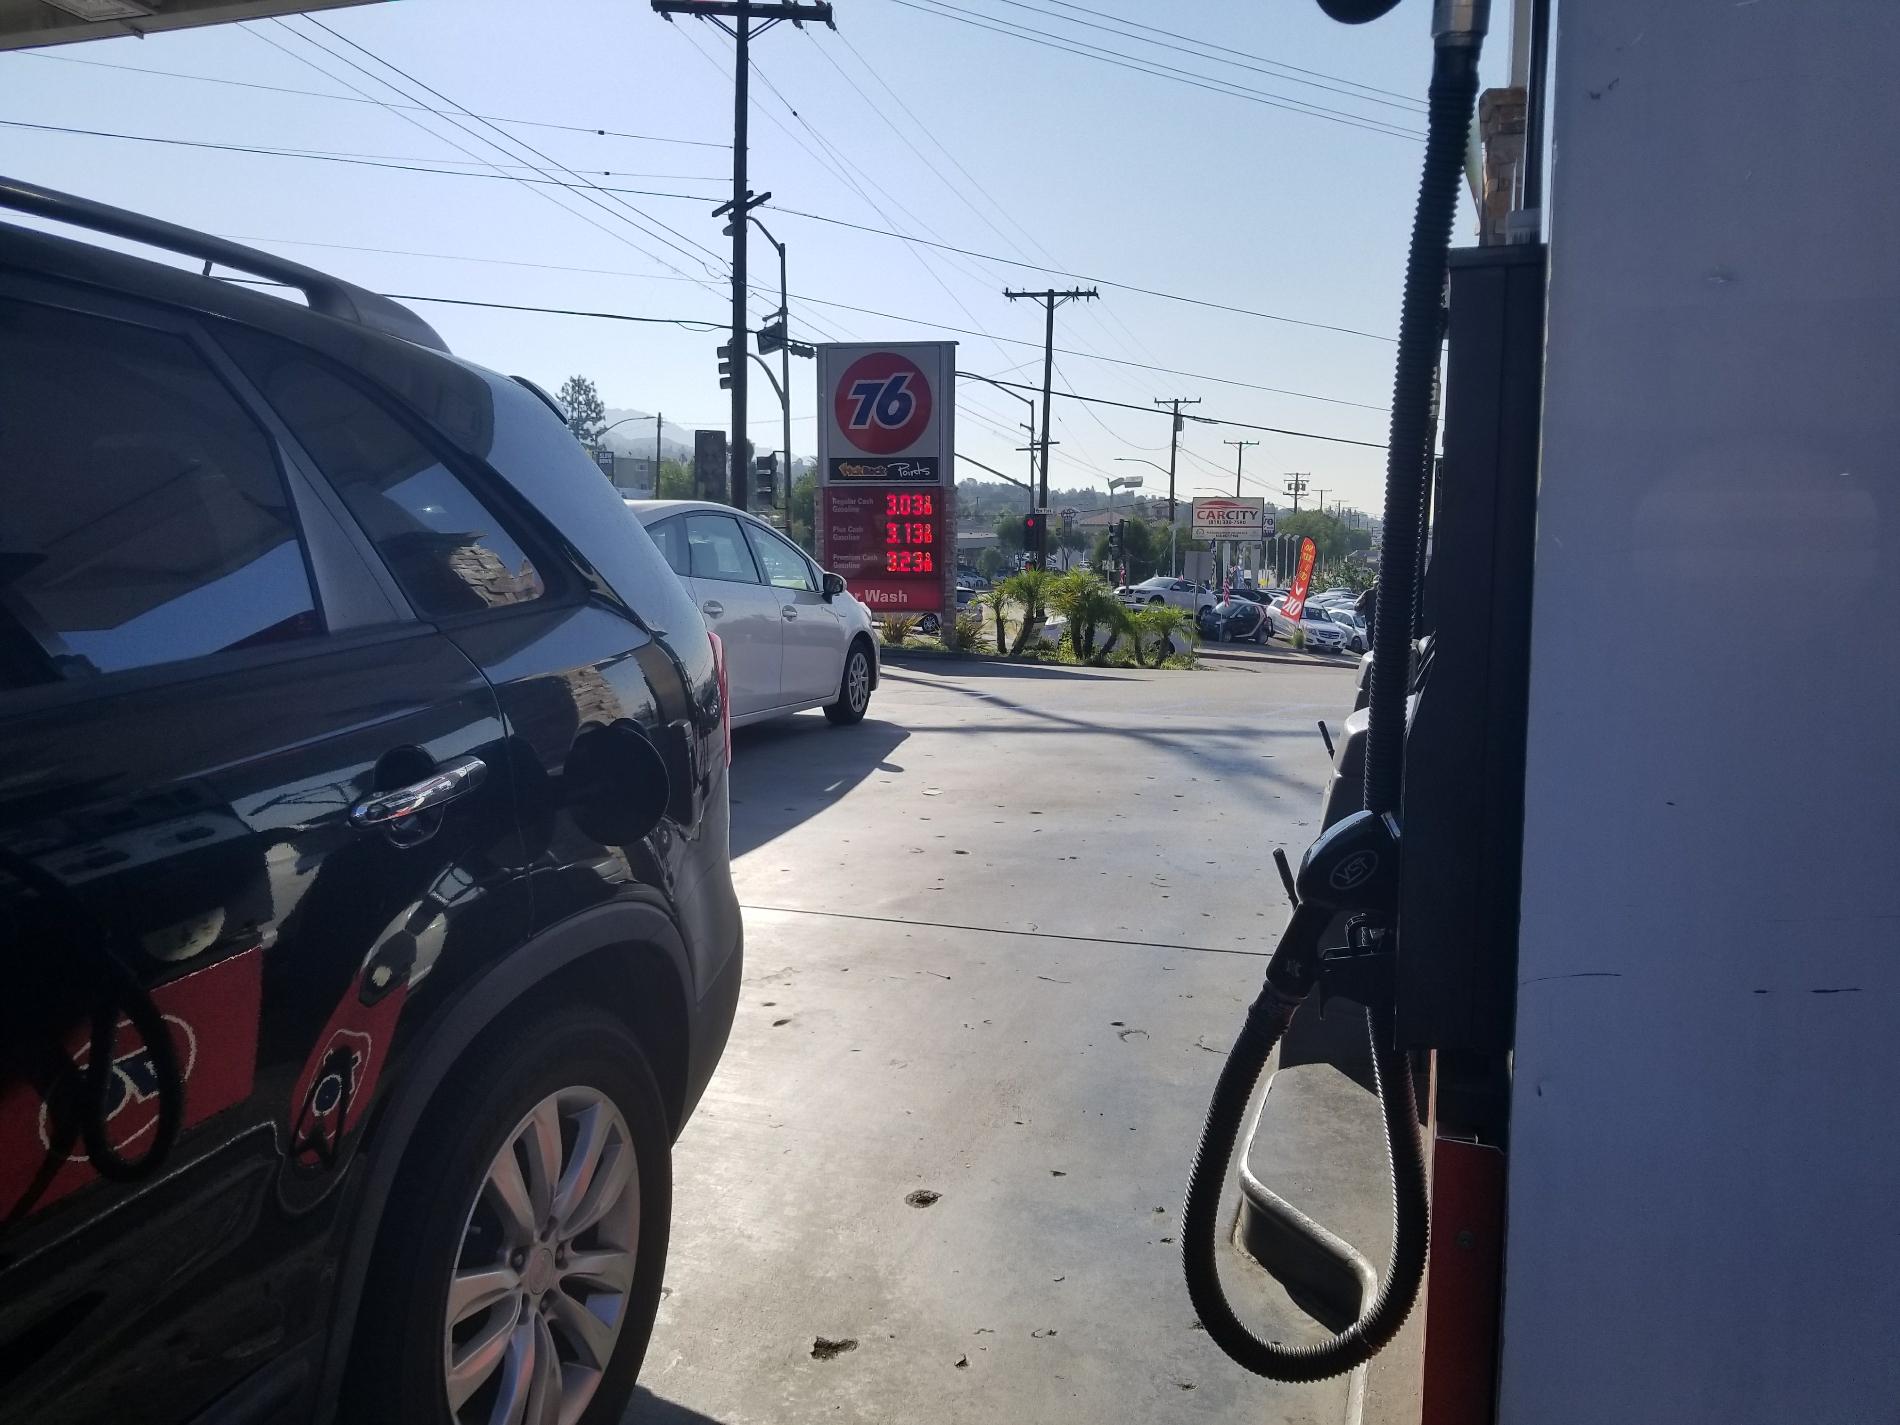 76 Station in La Crescenta